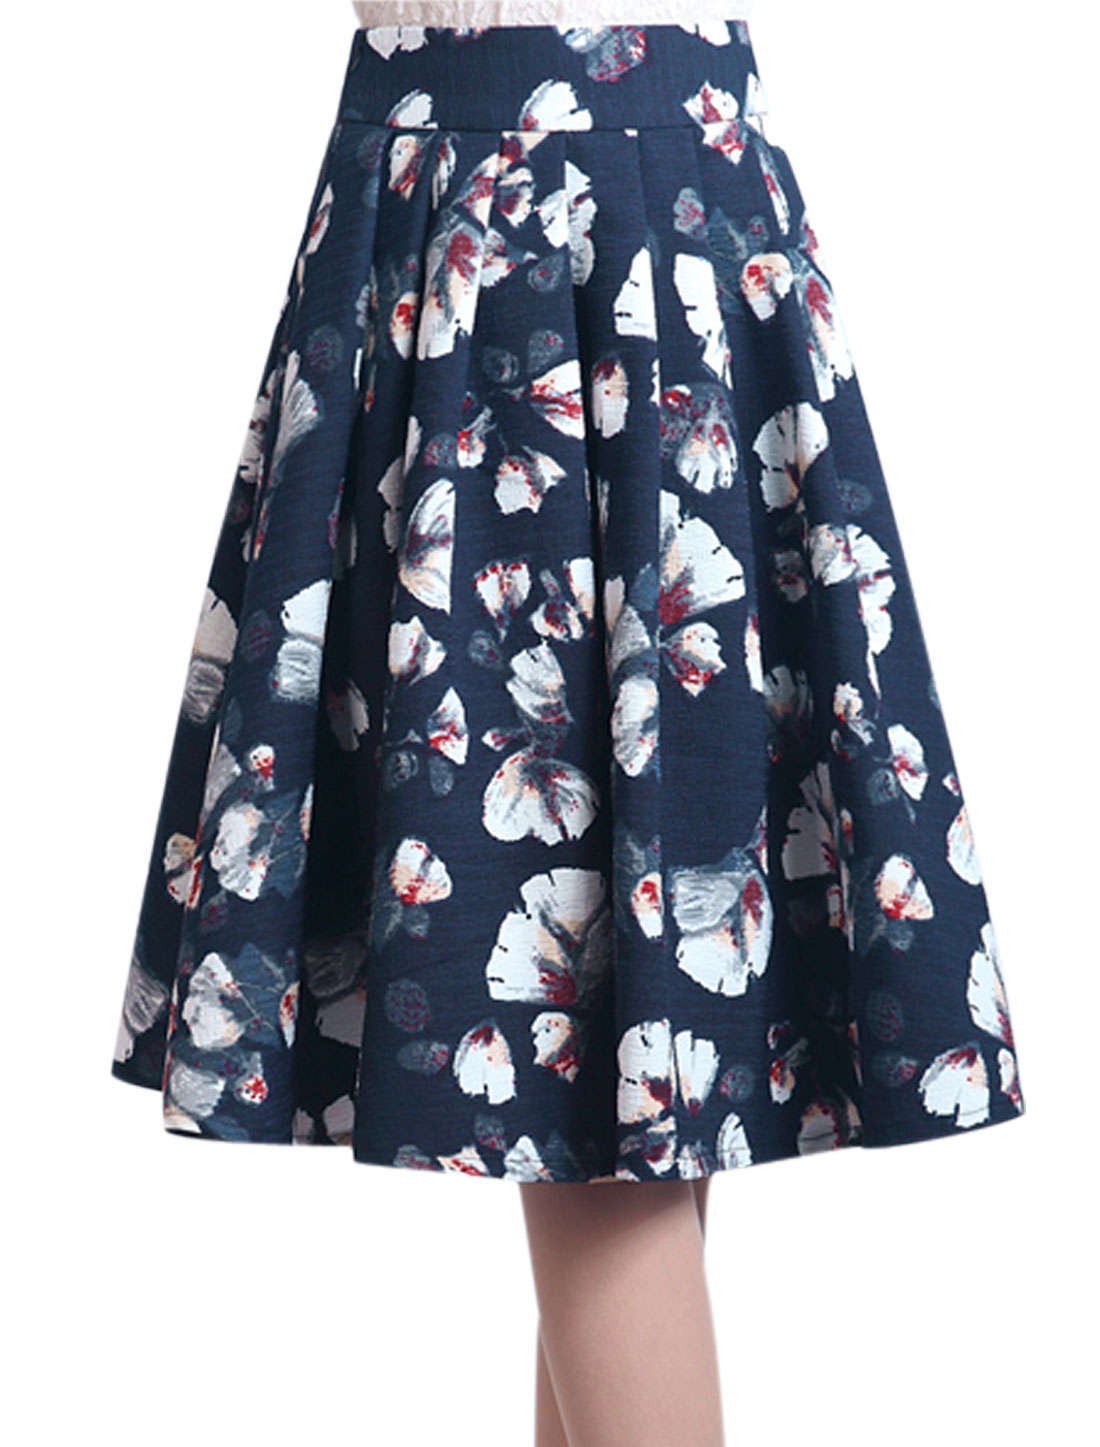 Women Elastic Waist Floral Prints Flare Fashion Full Skirt Navy Blue S